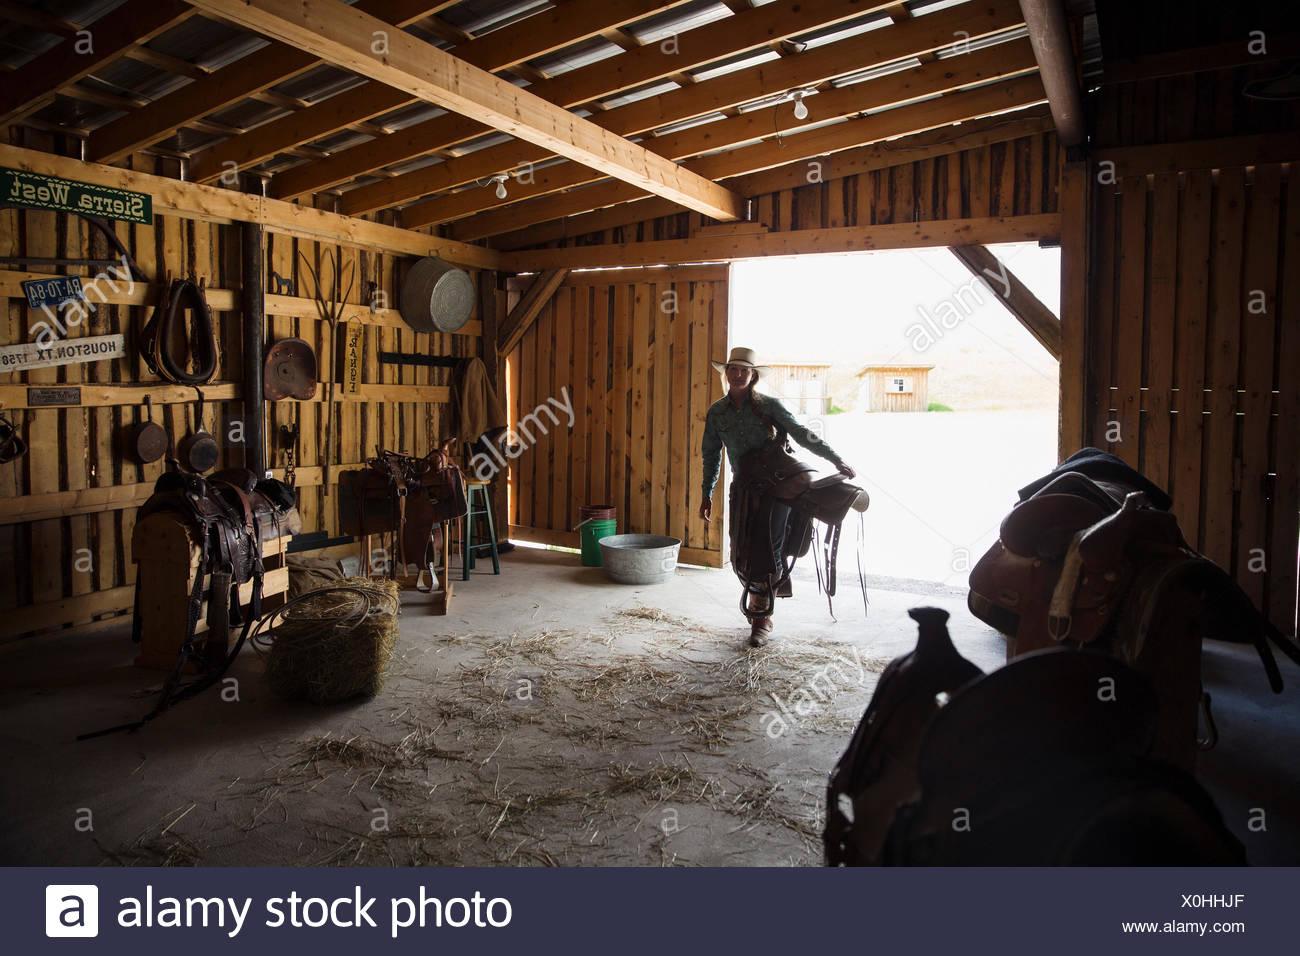 Saddle Room Stock Photos & Saddle Room Stock Images - Alamy